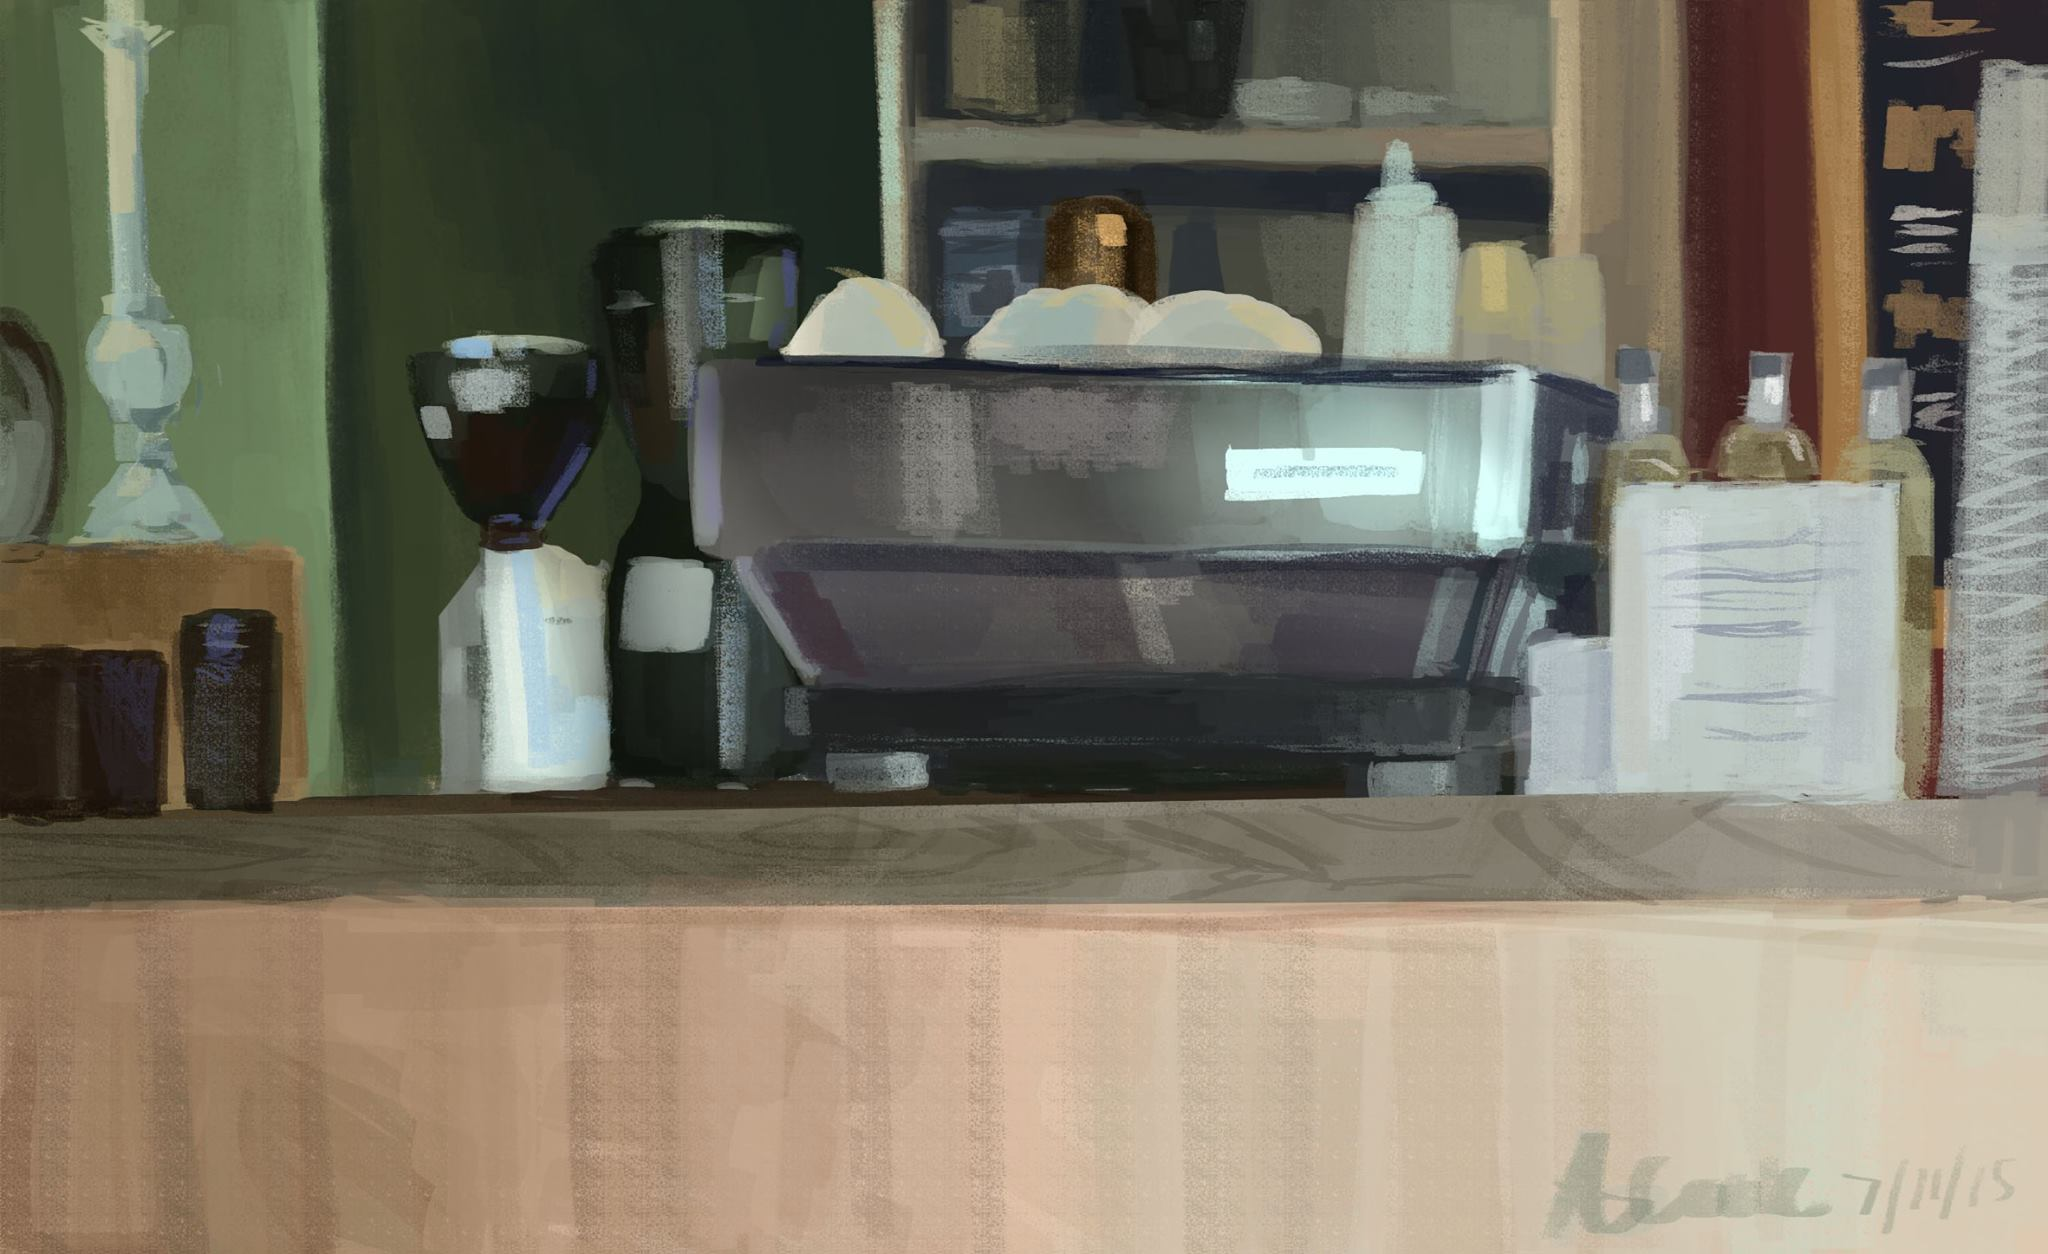 cafe study (2017_01_01 02_39_18 UTC).jpg